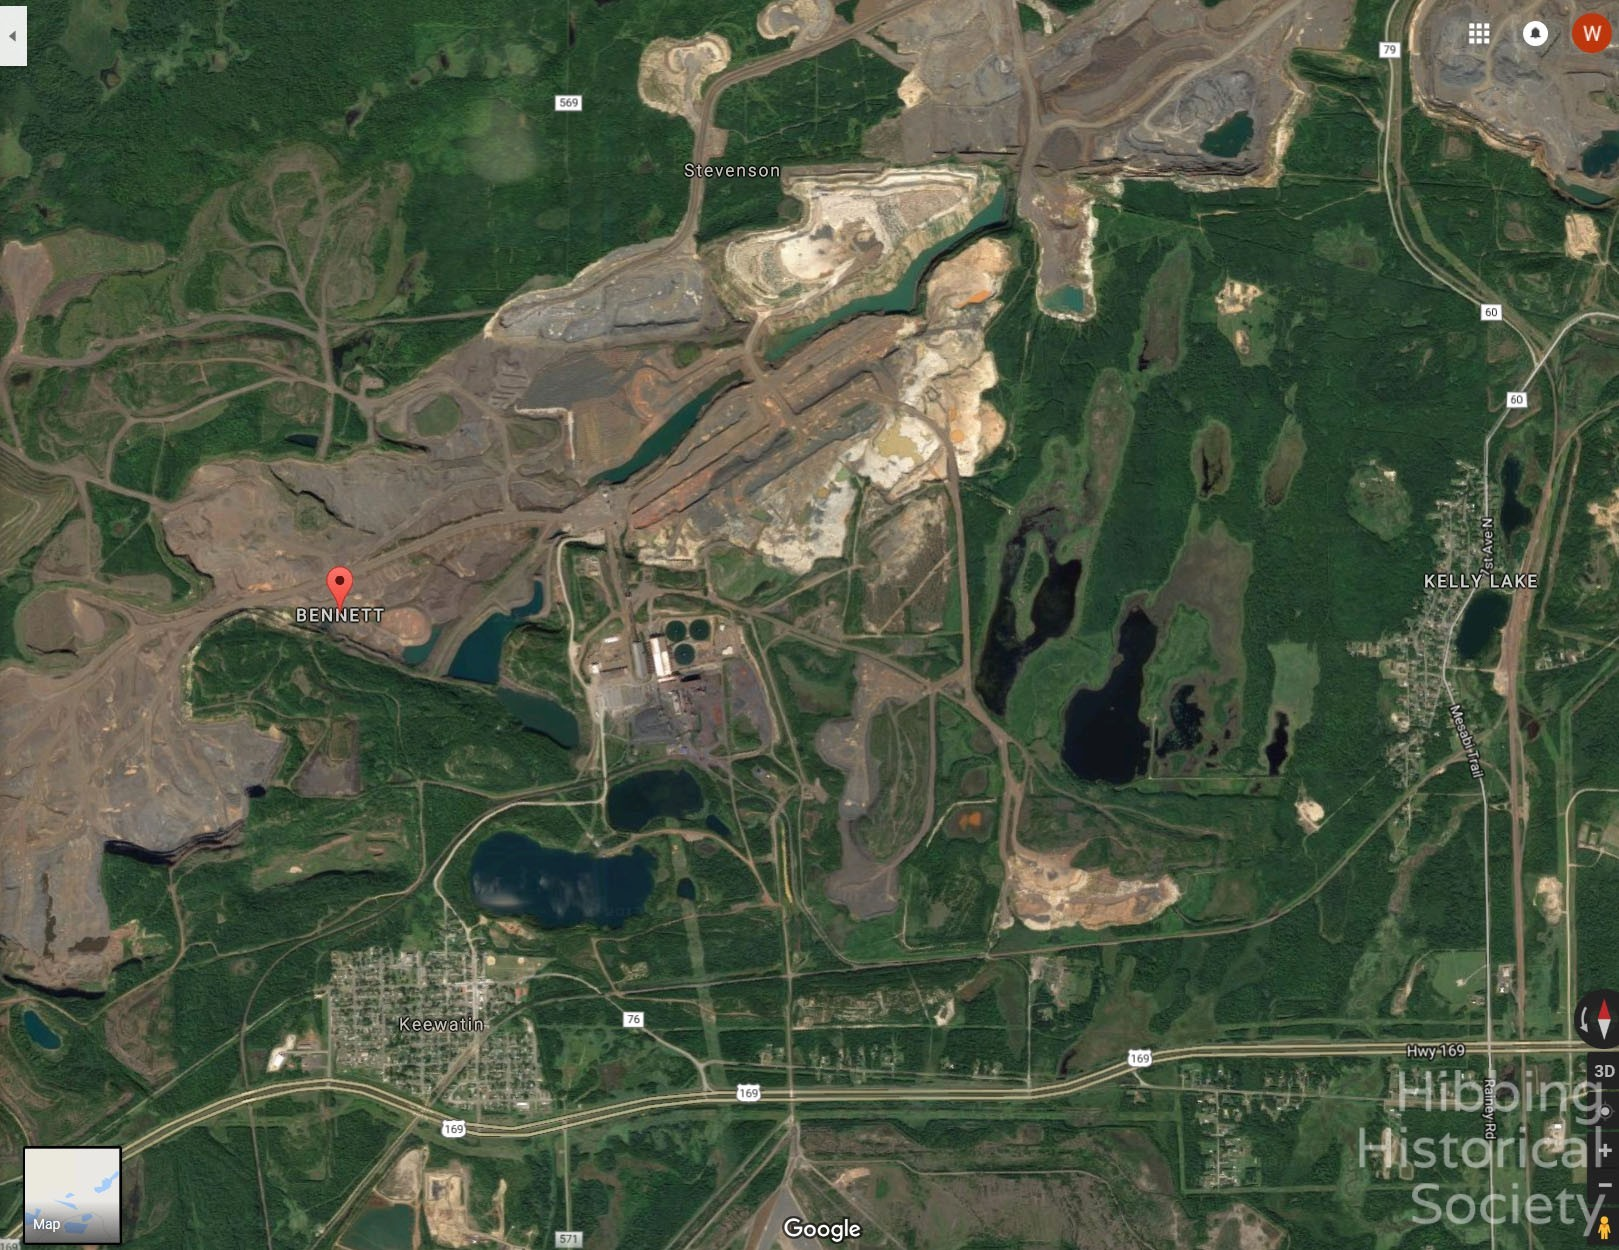 Bennett Location Image